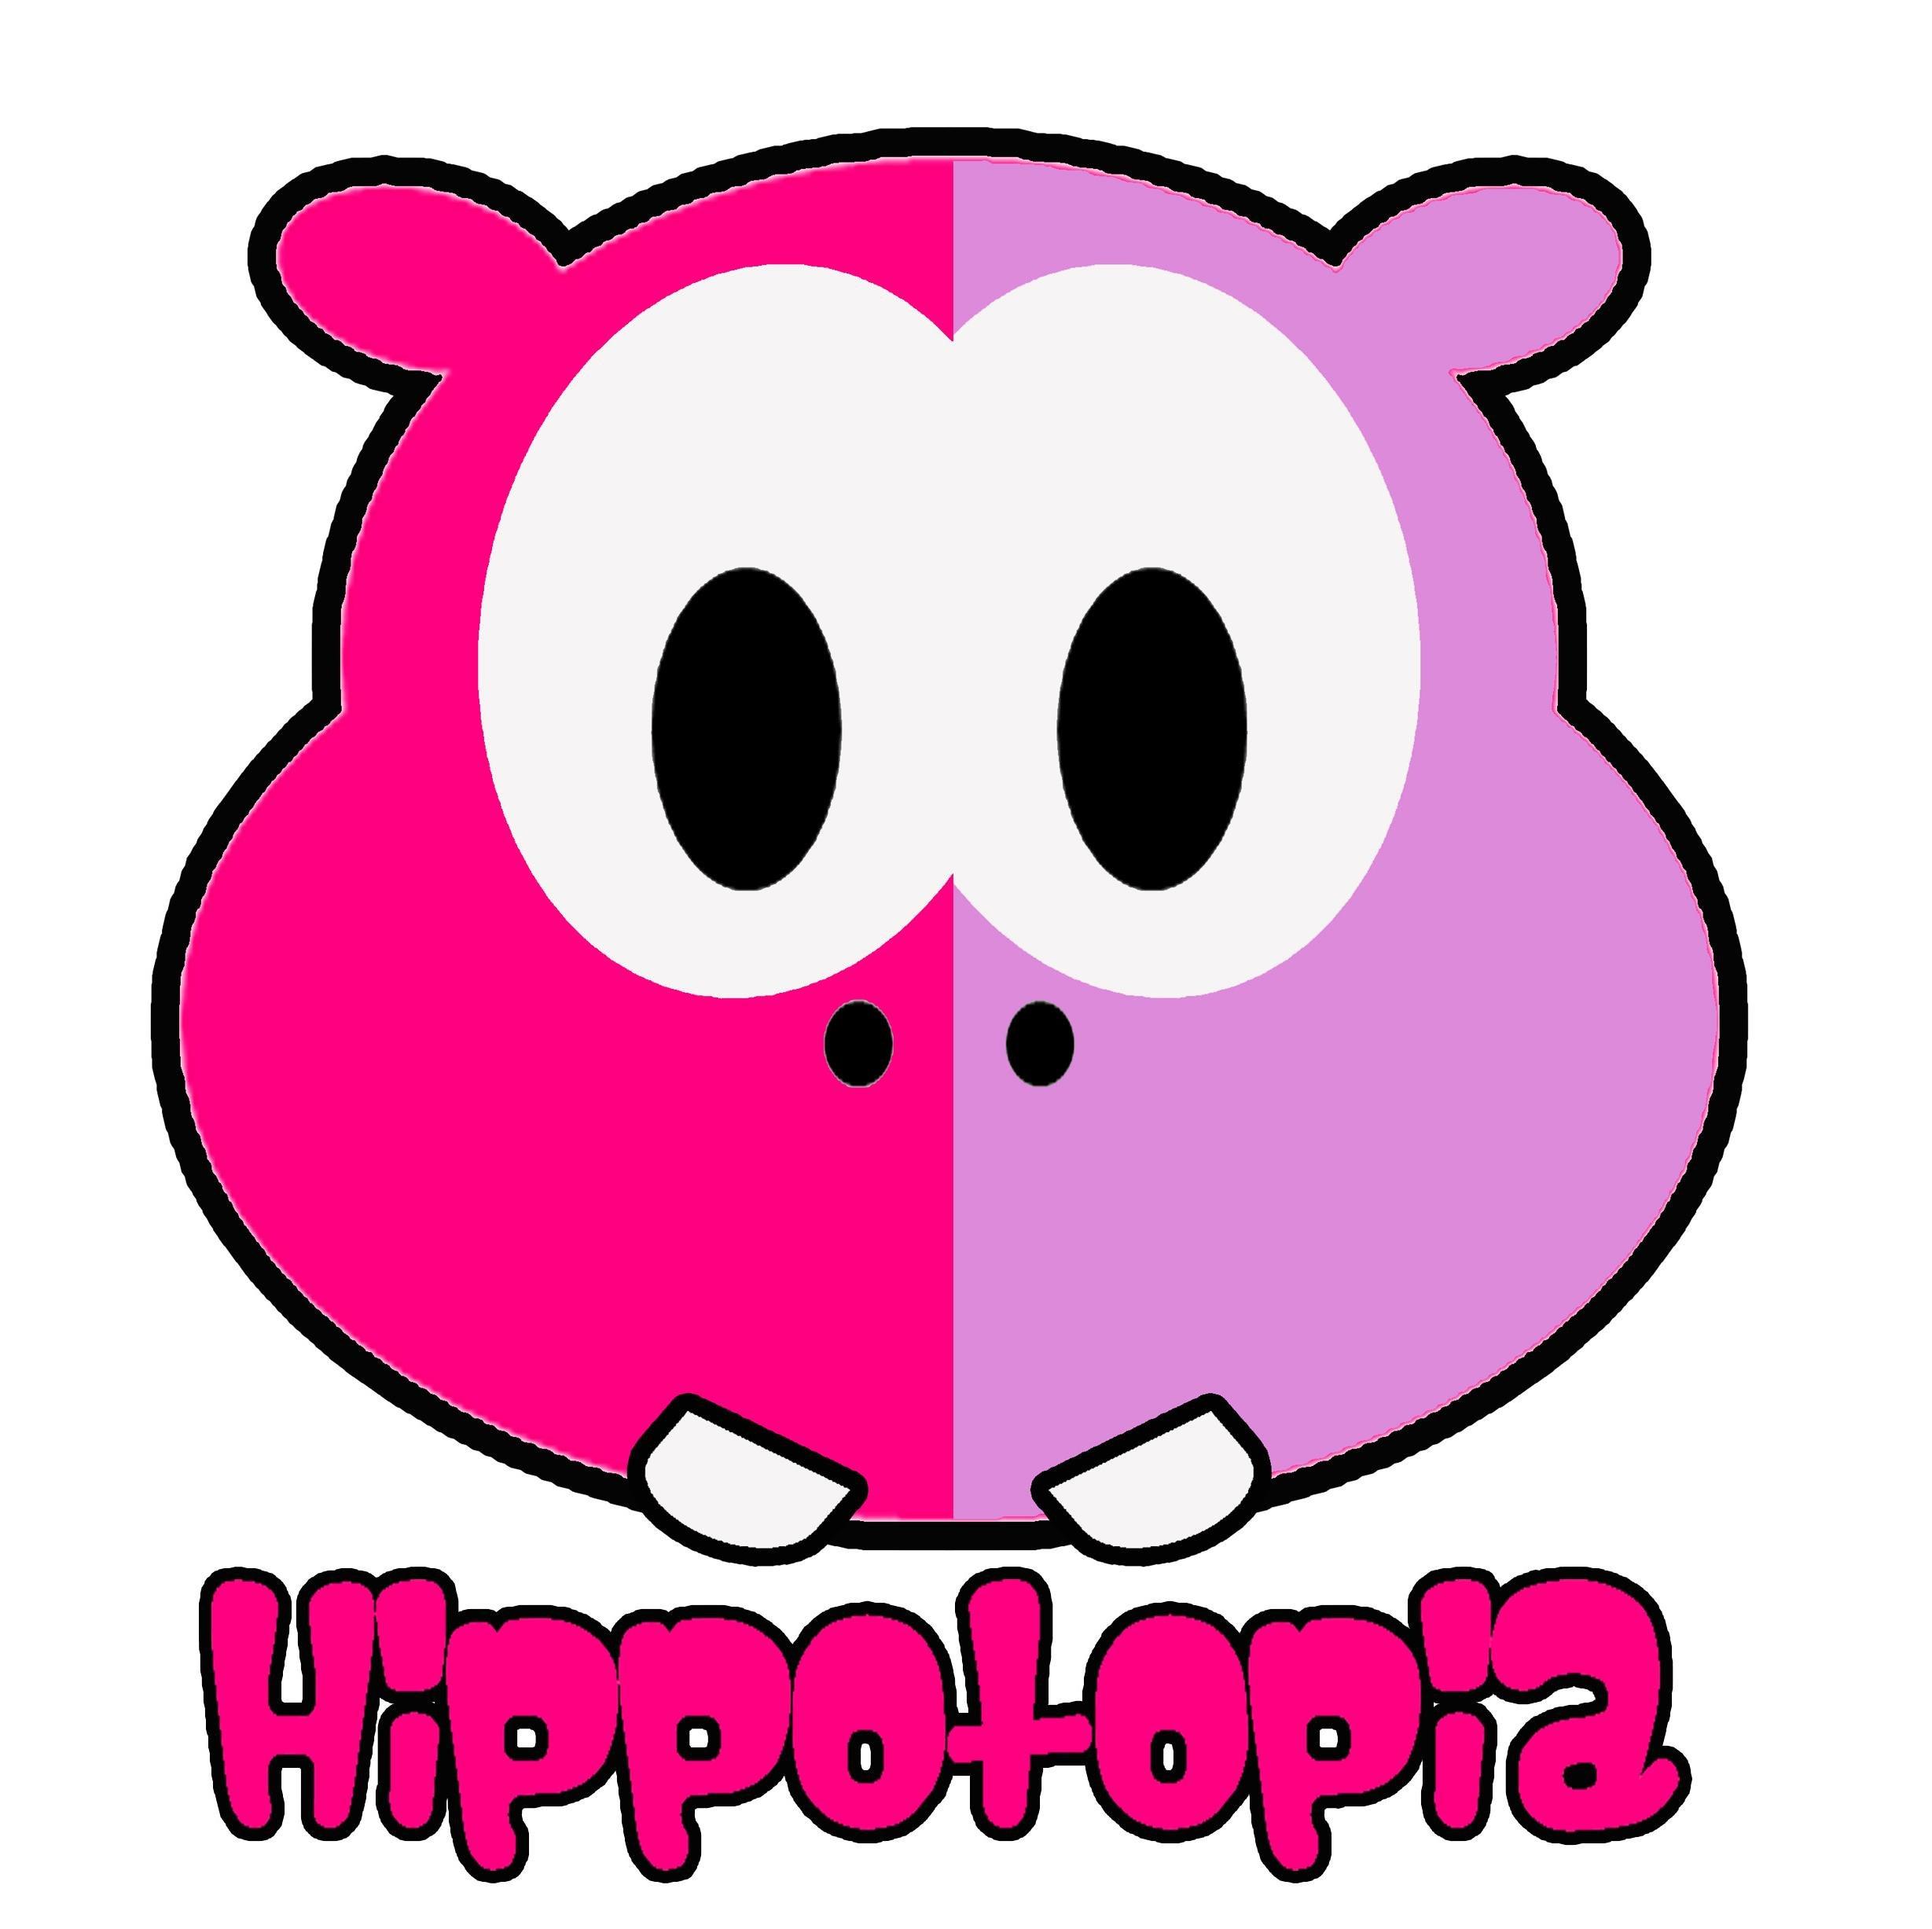 "hippotopia on Twitter: ""Alhamdulillah walaupun vokalis flu & jari."